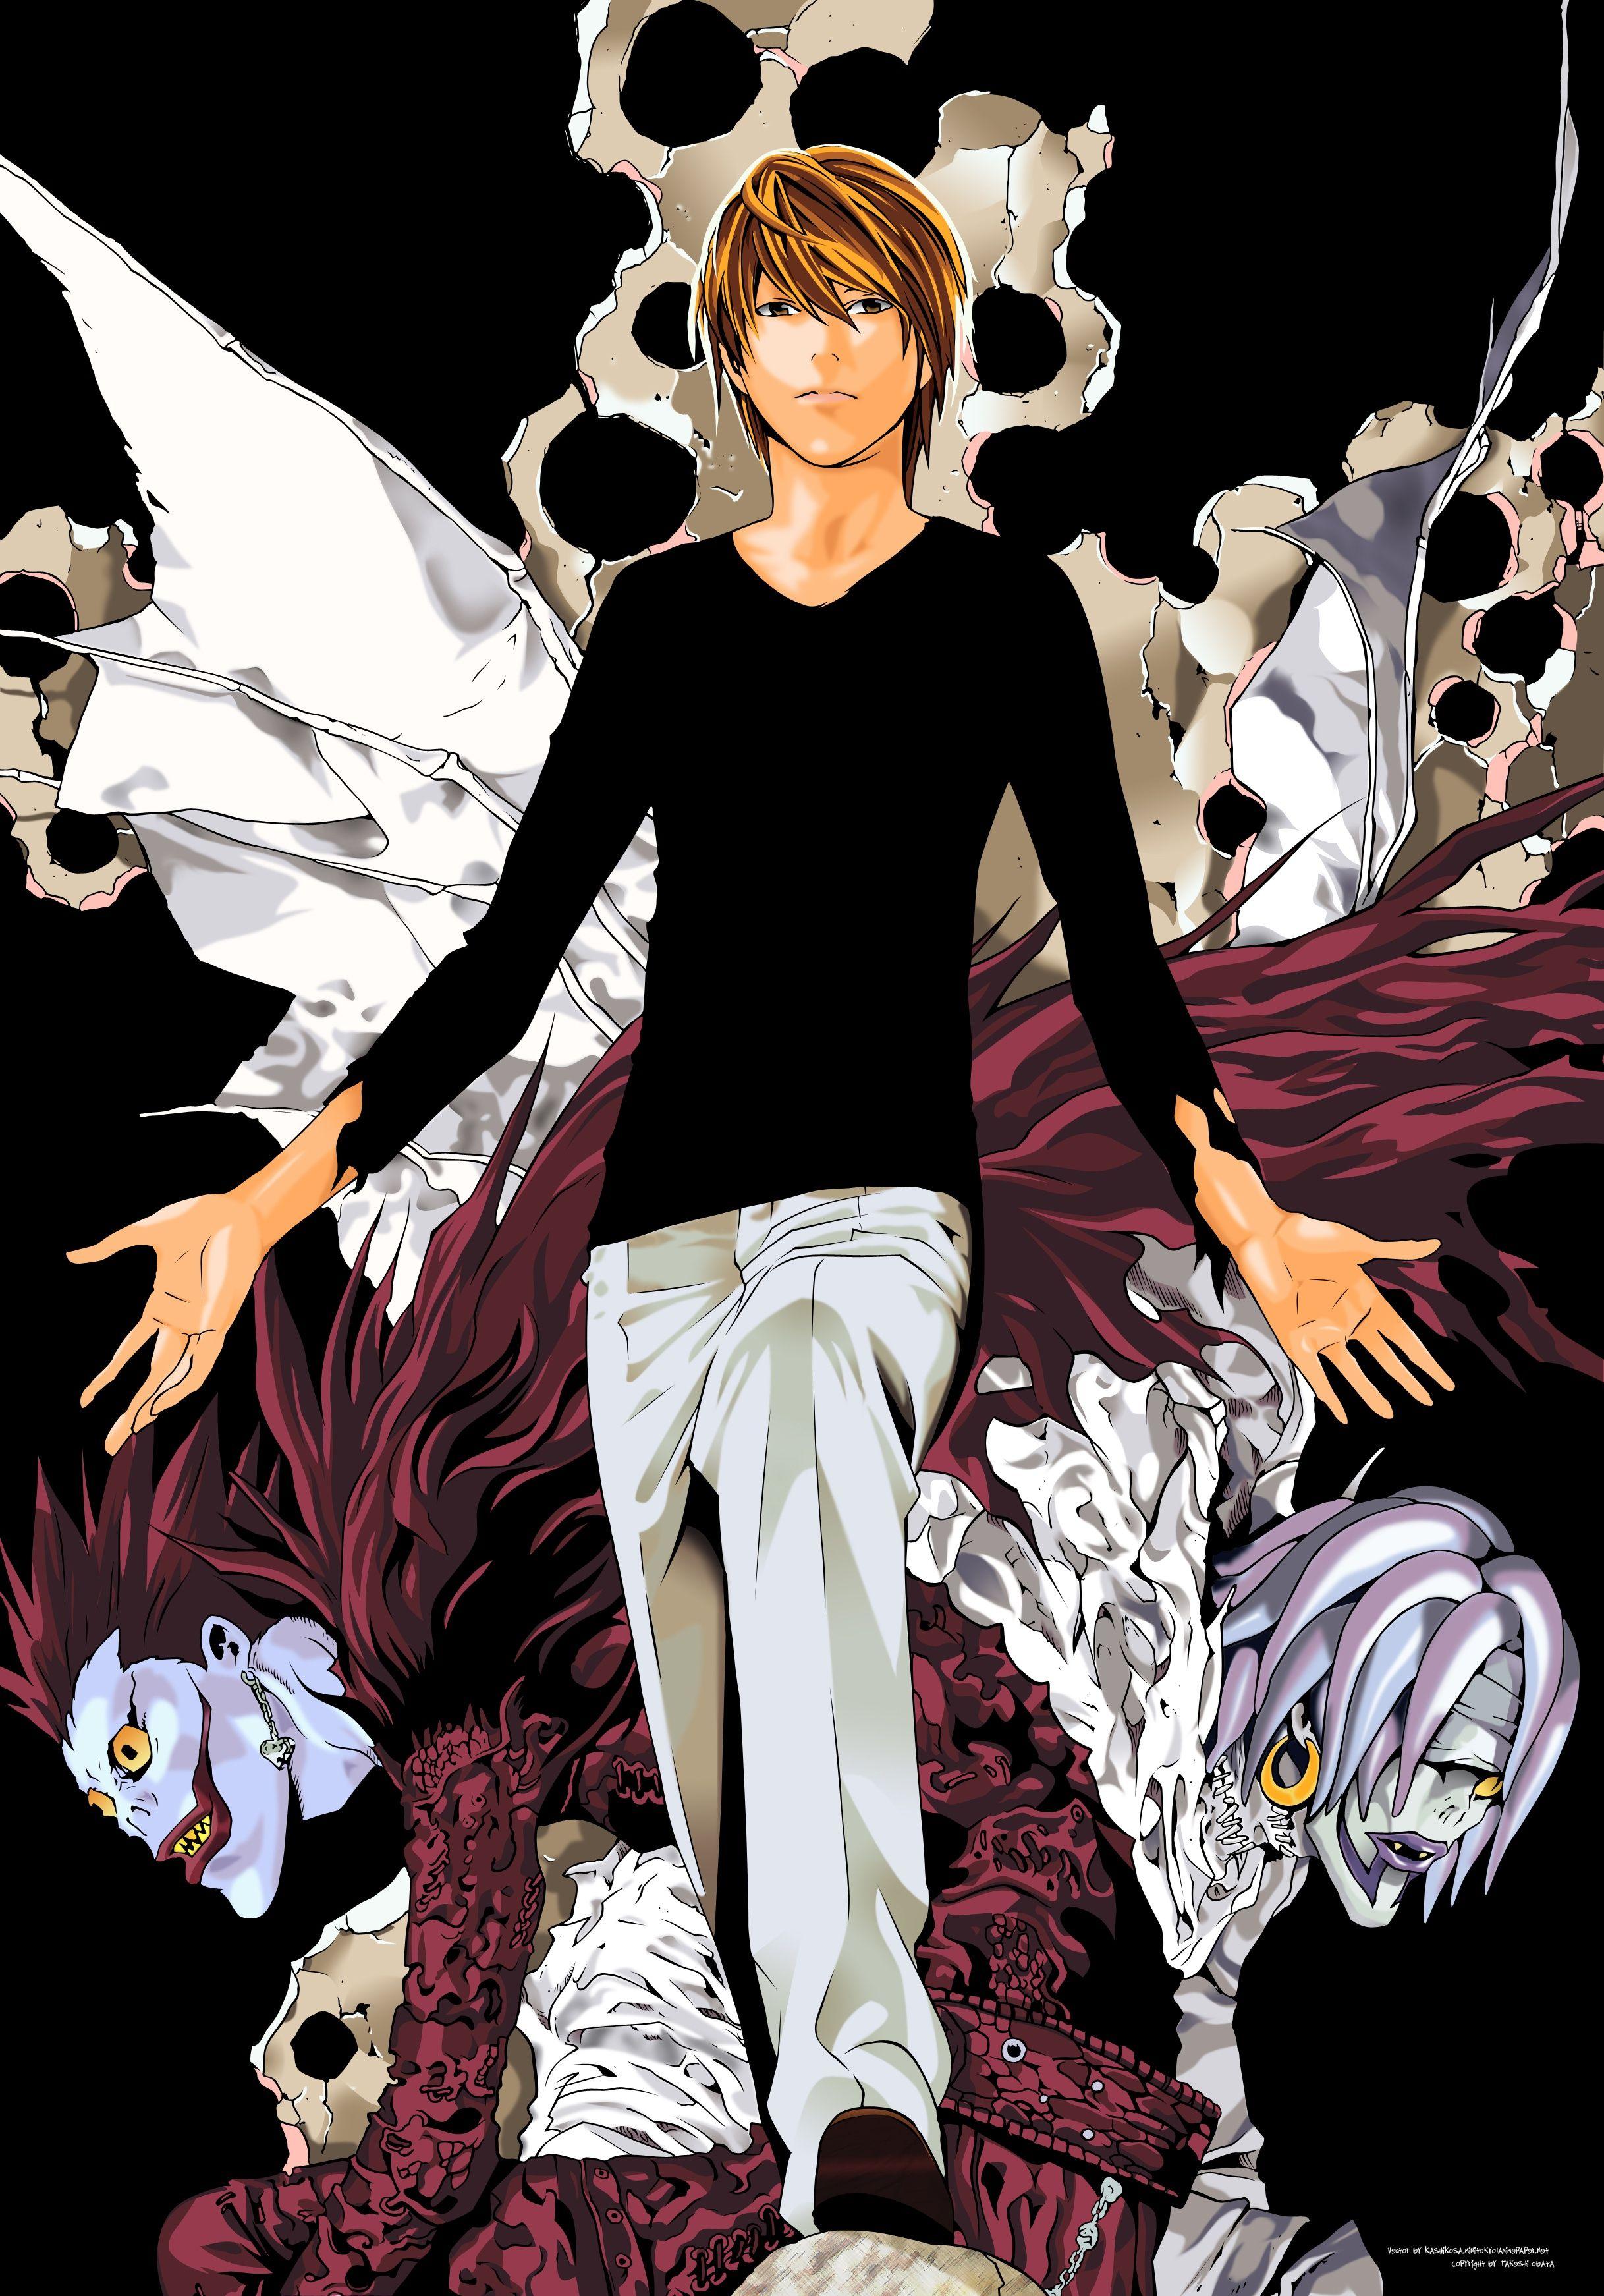 Death note light yagami kira death note anime - Manga death note ...